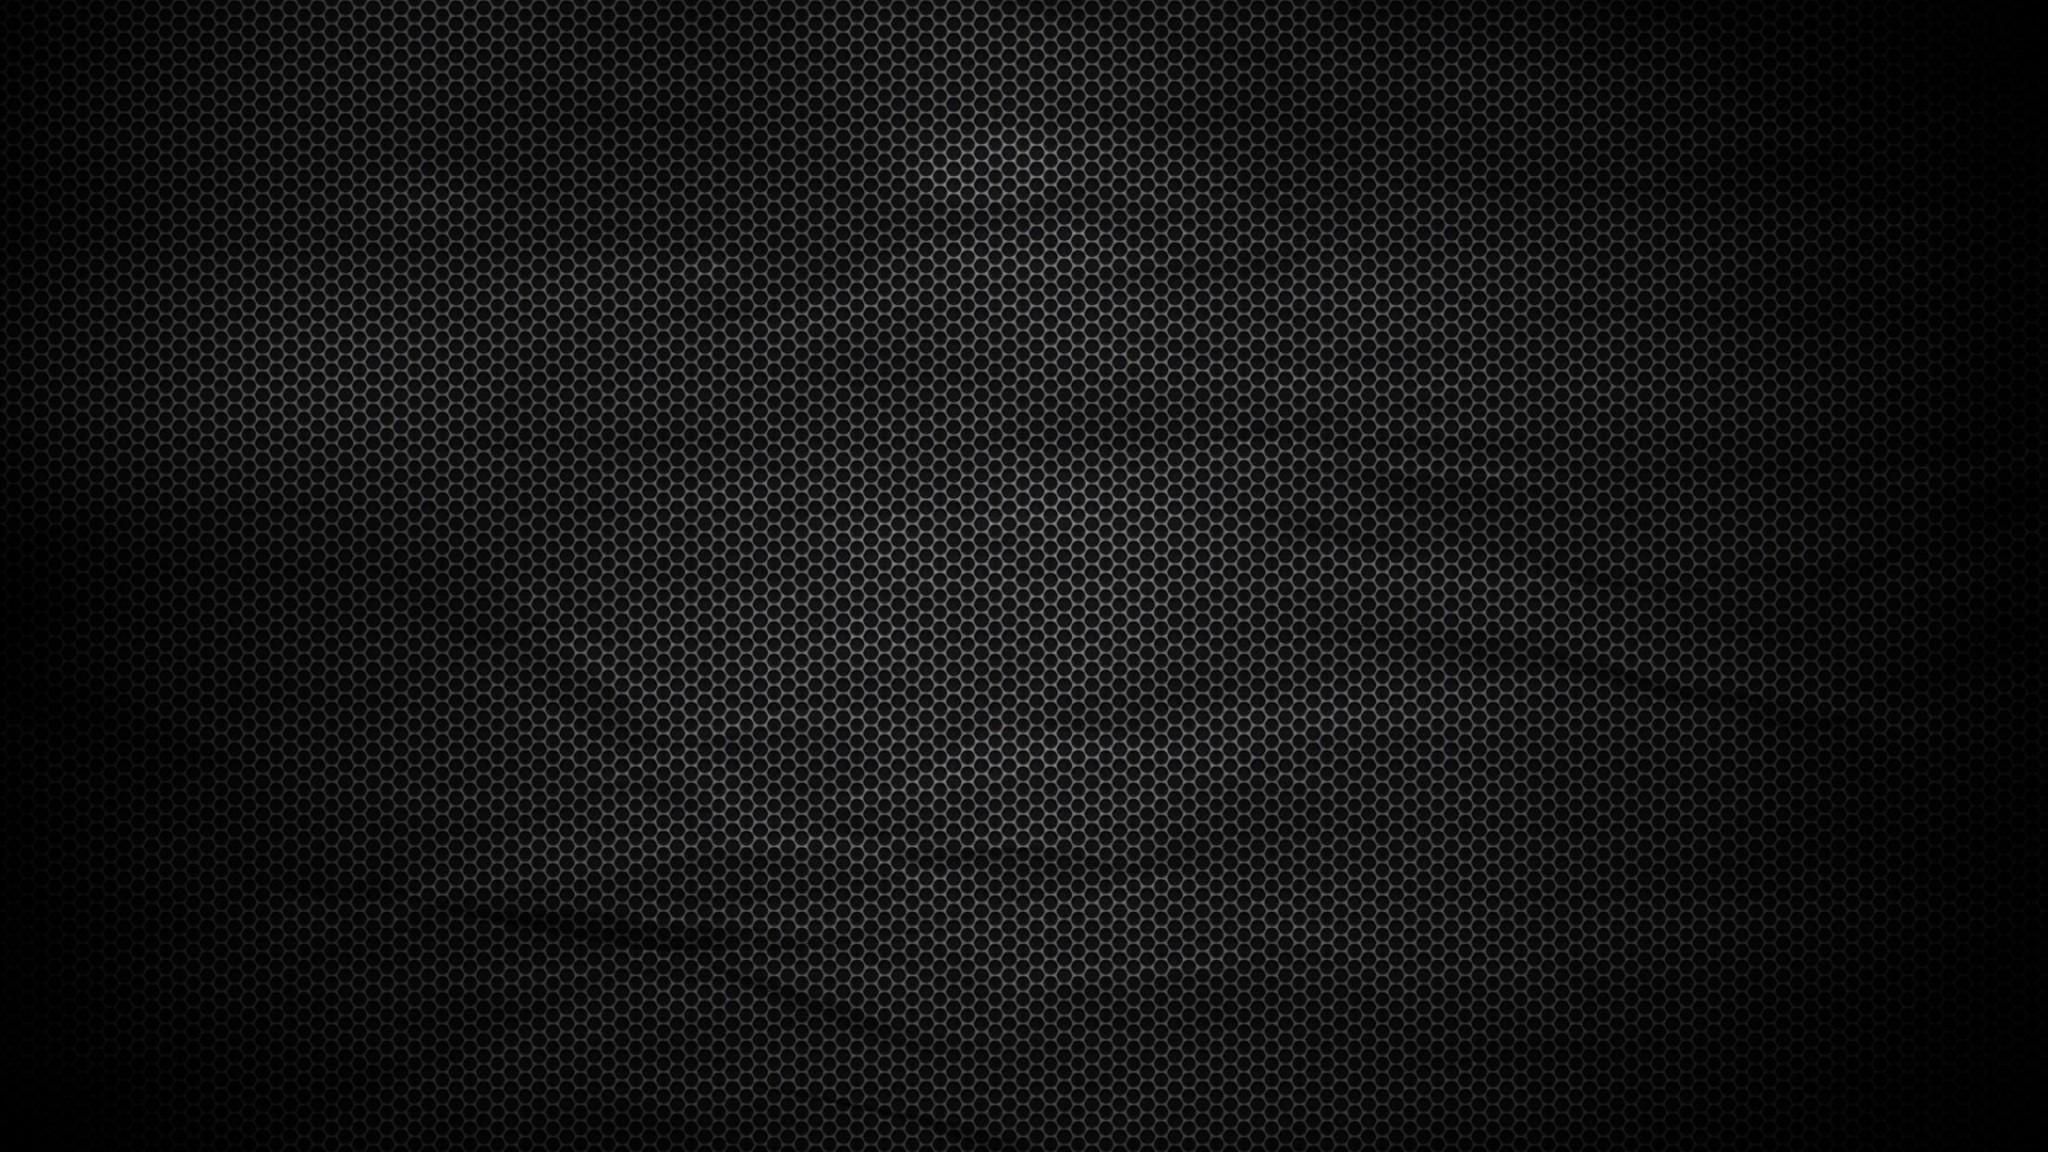 2048x1152 white background